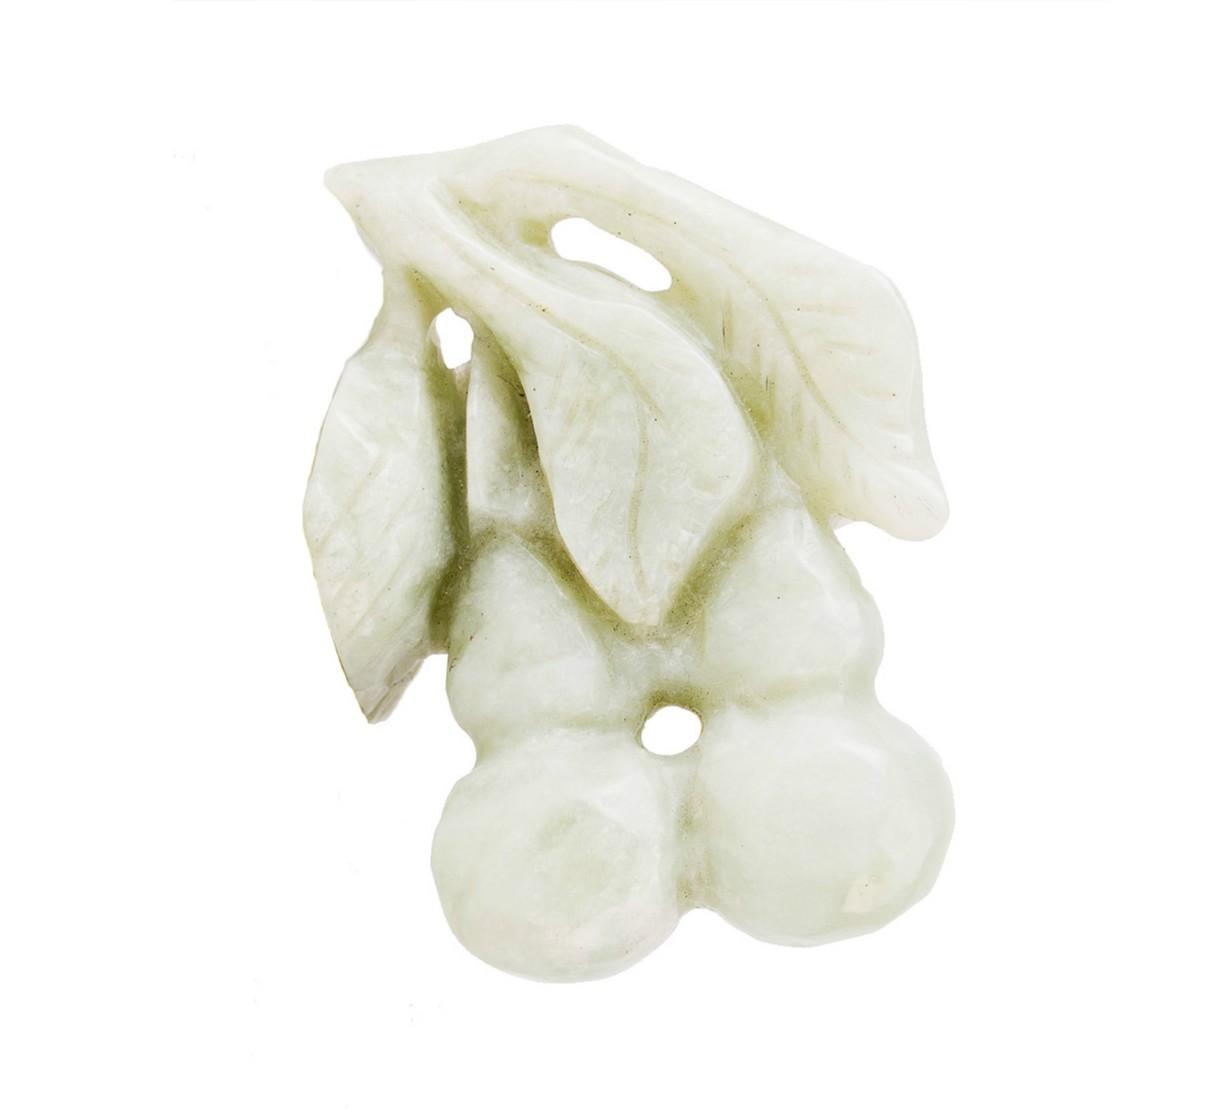 Pereche Wu Lou - jad - marime mare - model 2